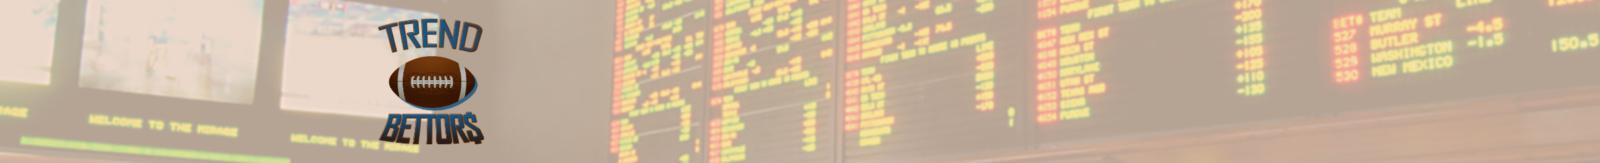 trend-bettors-sports-betting-service